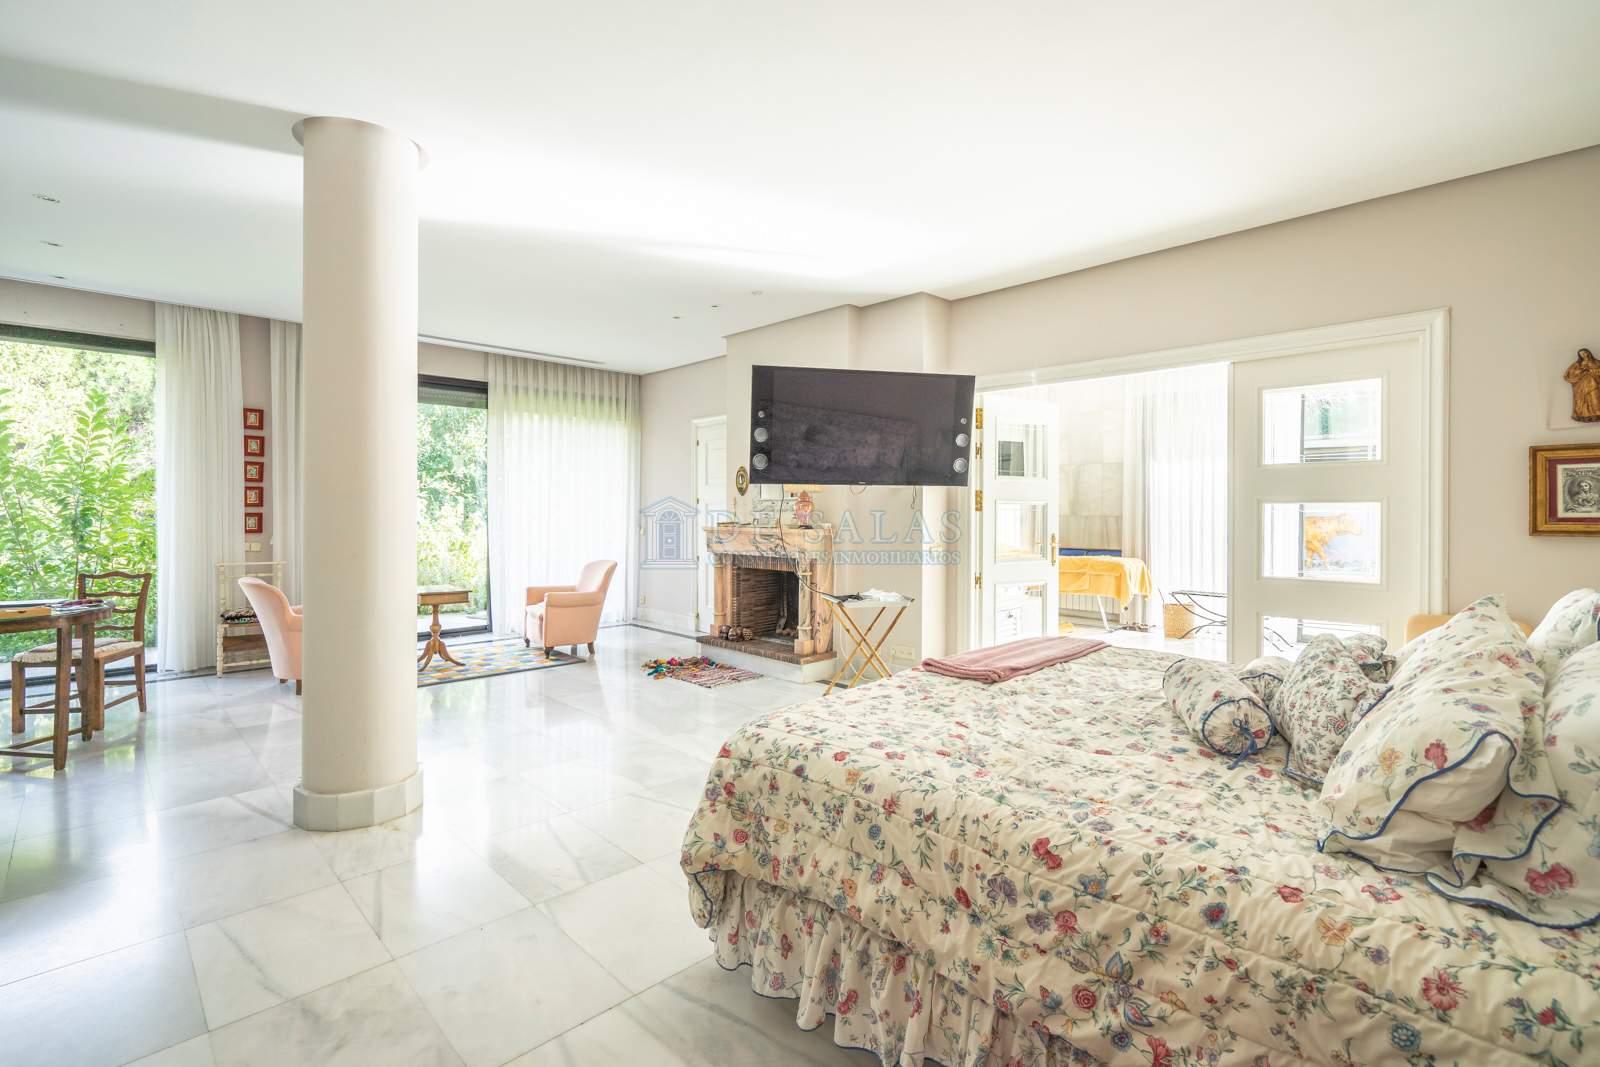 Dormitorio-15 Chalet La Moraleja